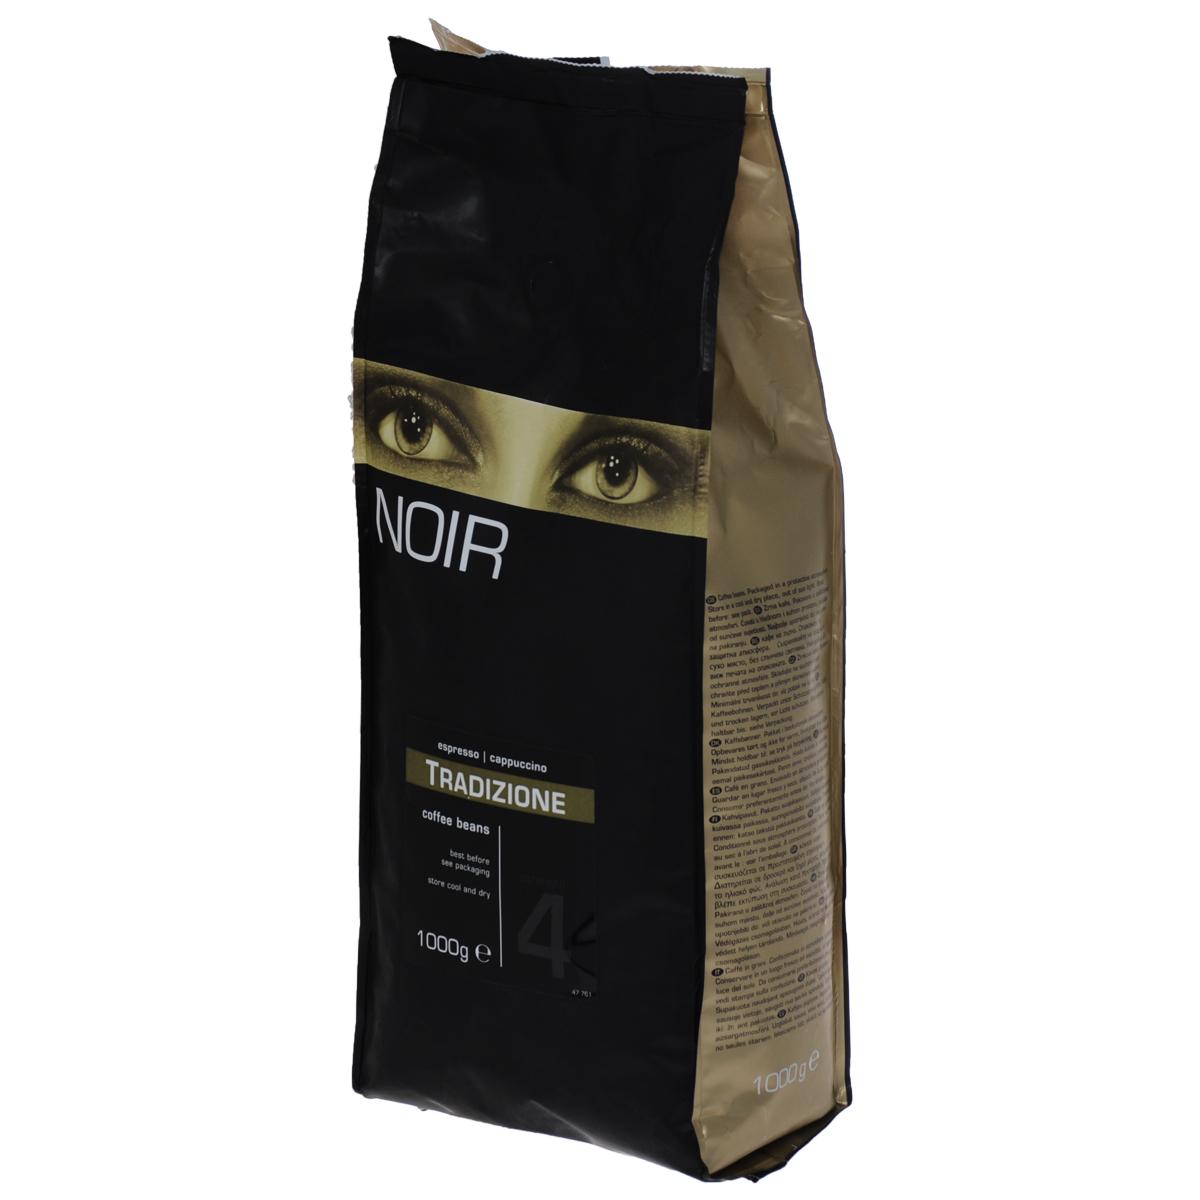 Noir Tradizion кофе в зернах, 1 кг футболка supremebeing pantera noir ss14 black 8901 xl